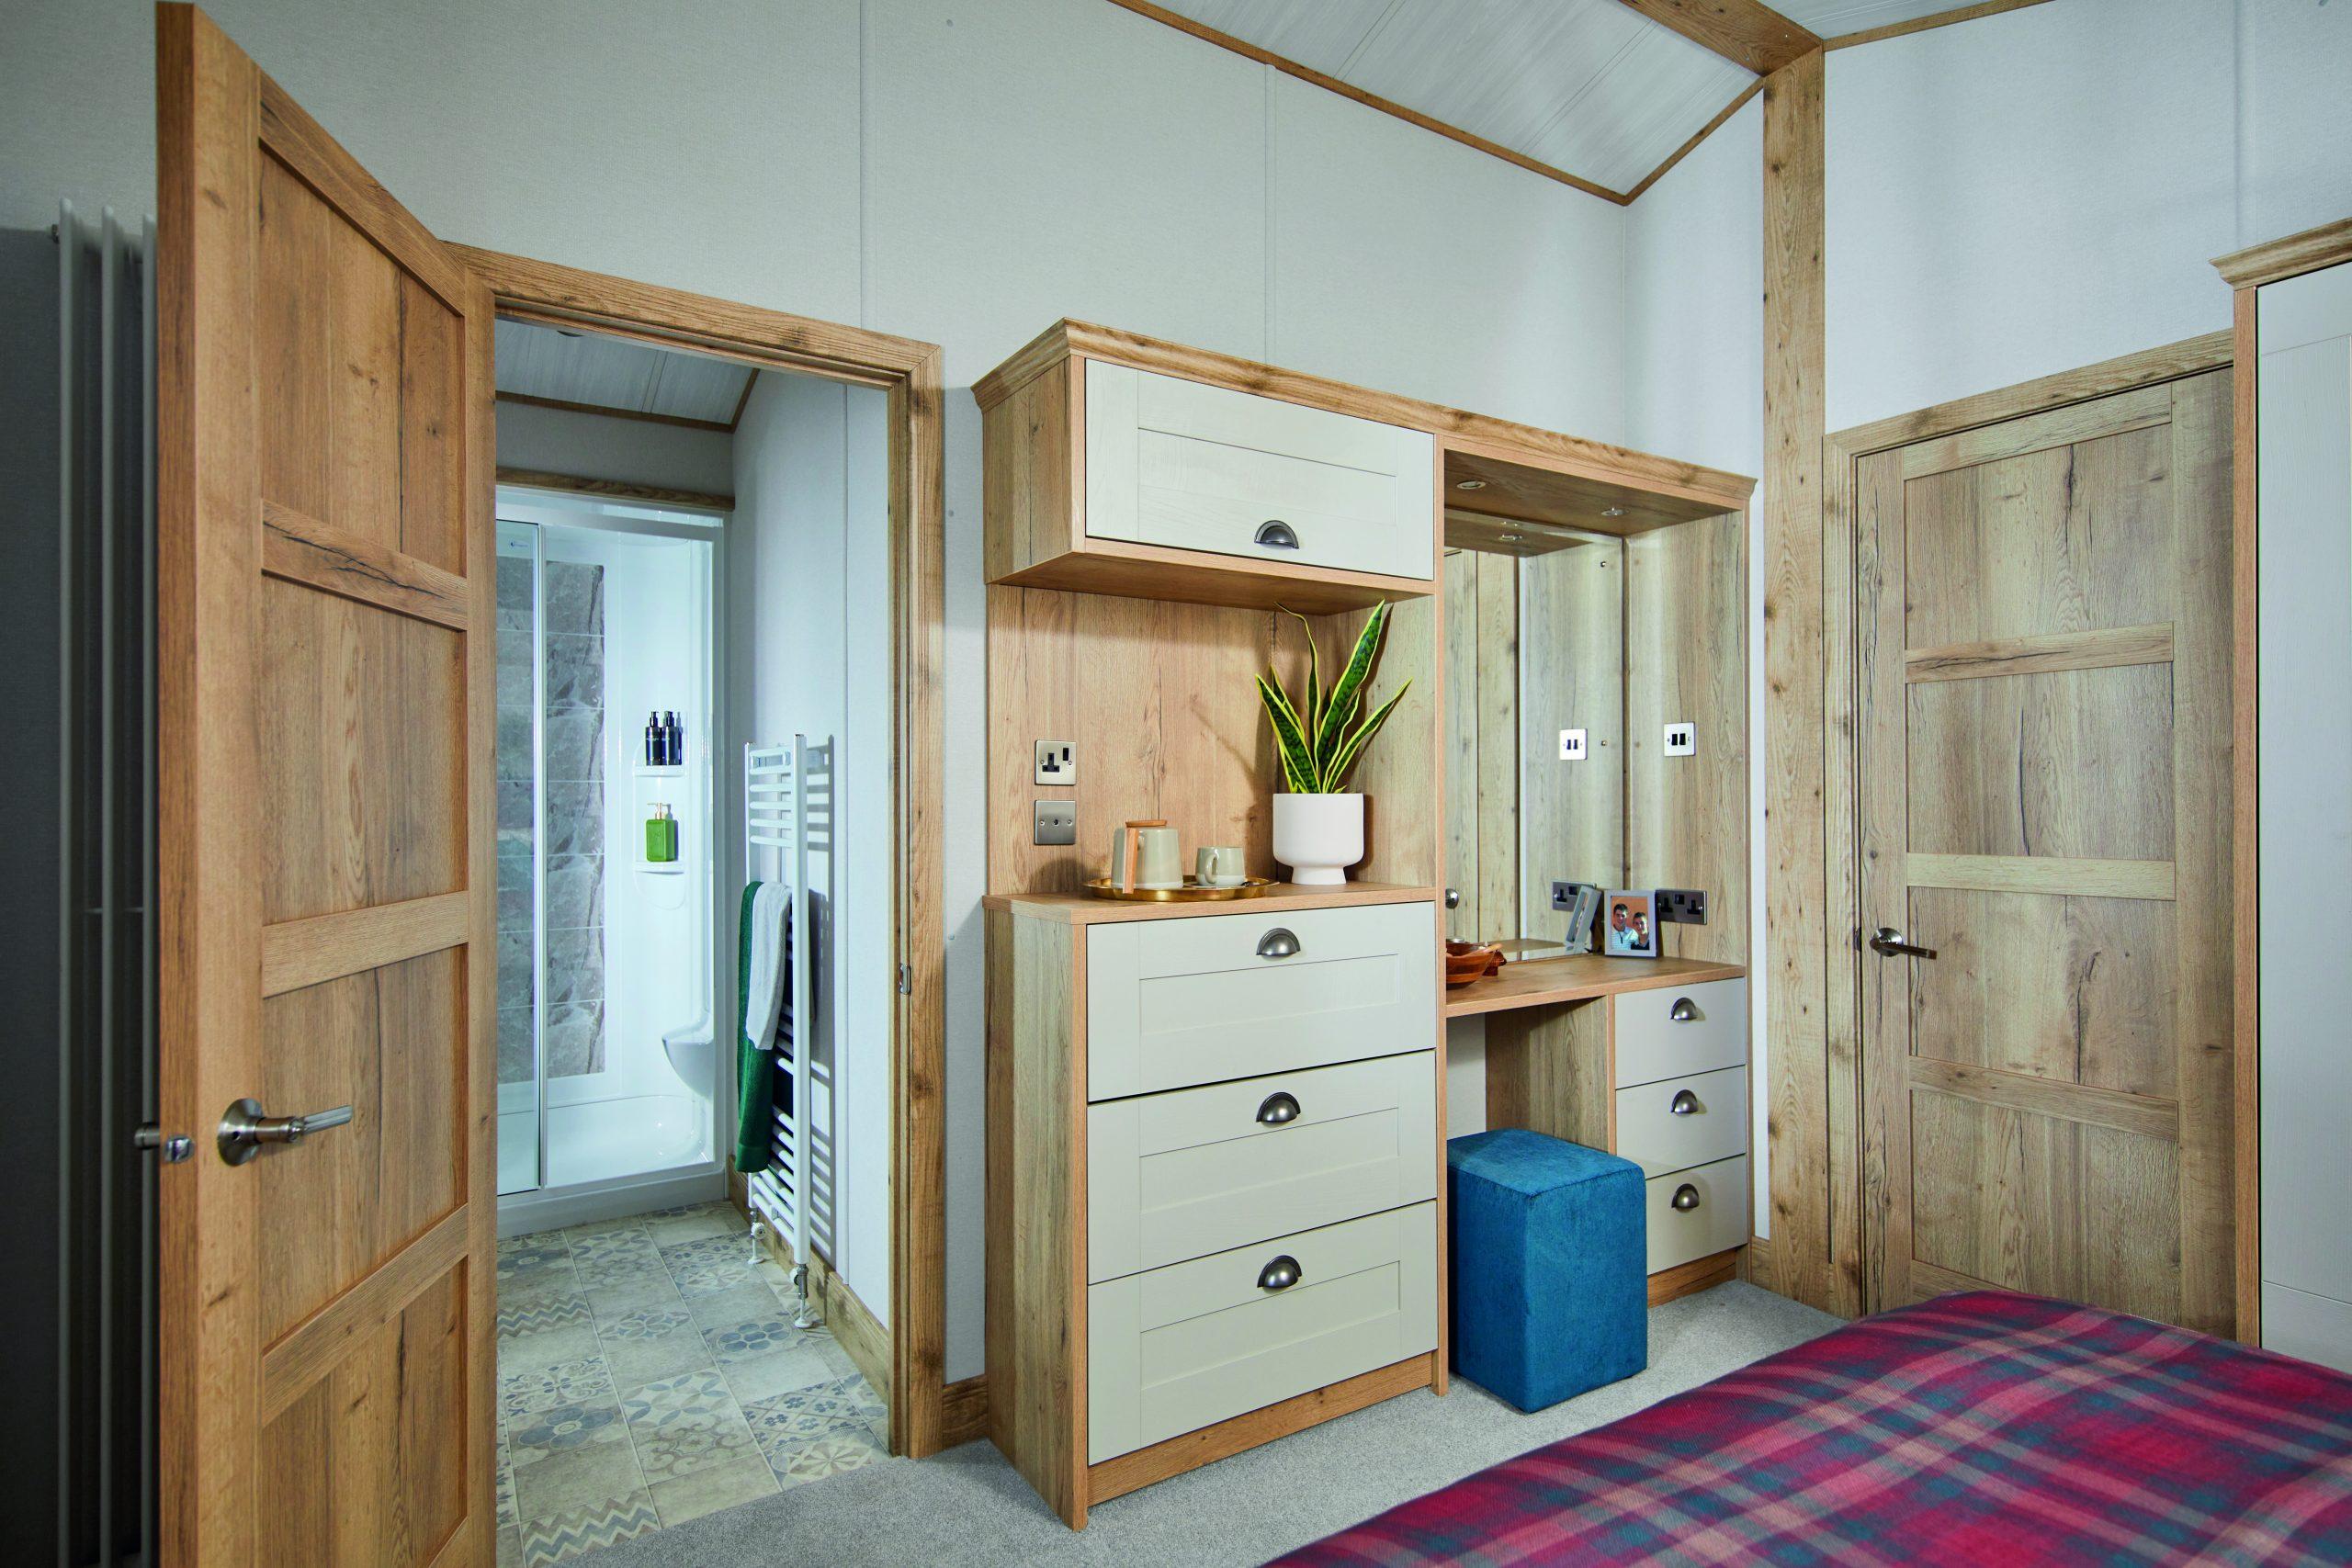 holiday park lincolnshire, log cabin holidays lincolnshire, holiday log cabins lincolnshire